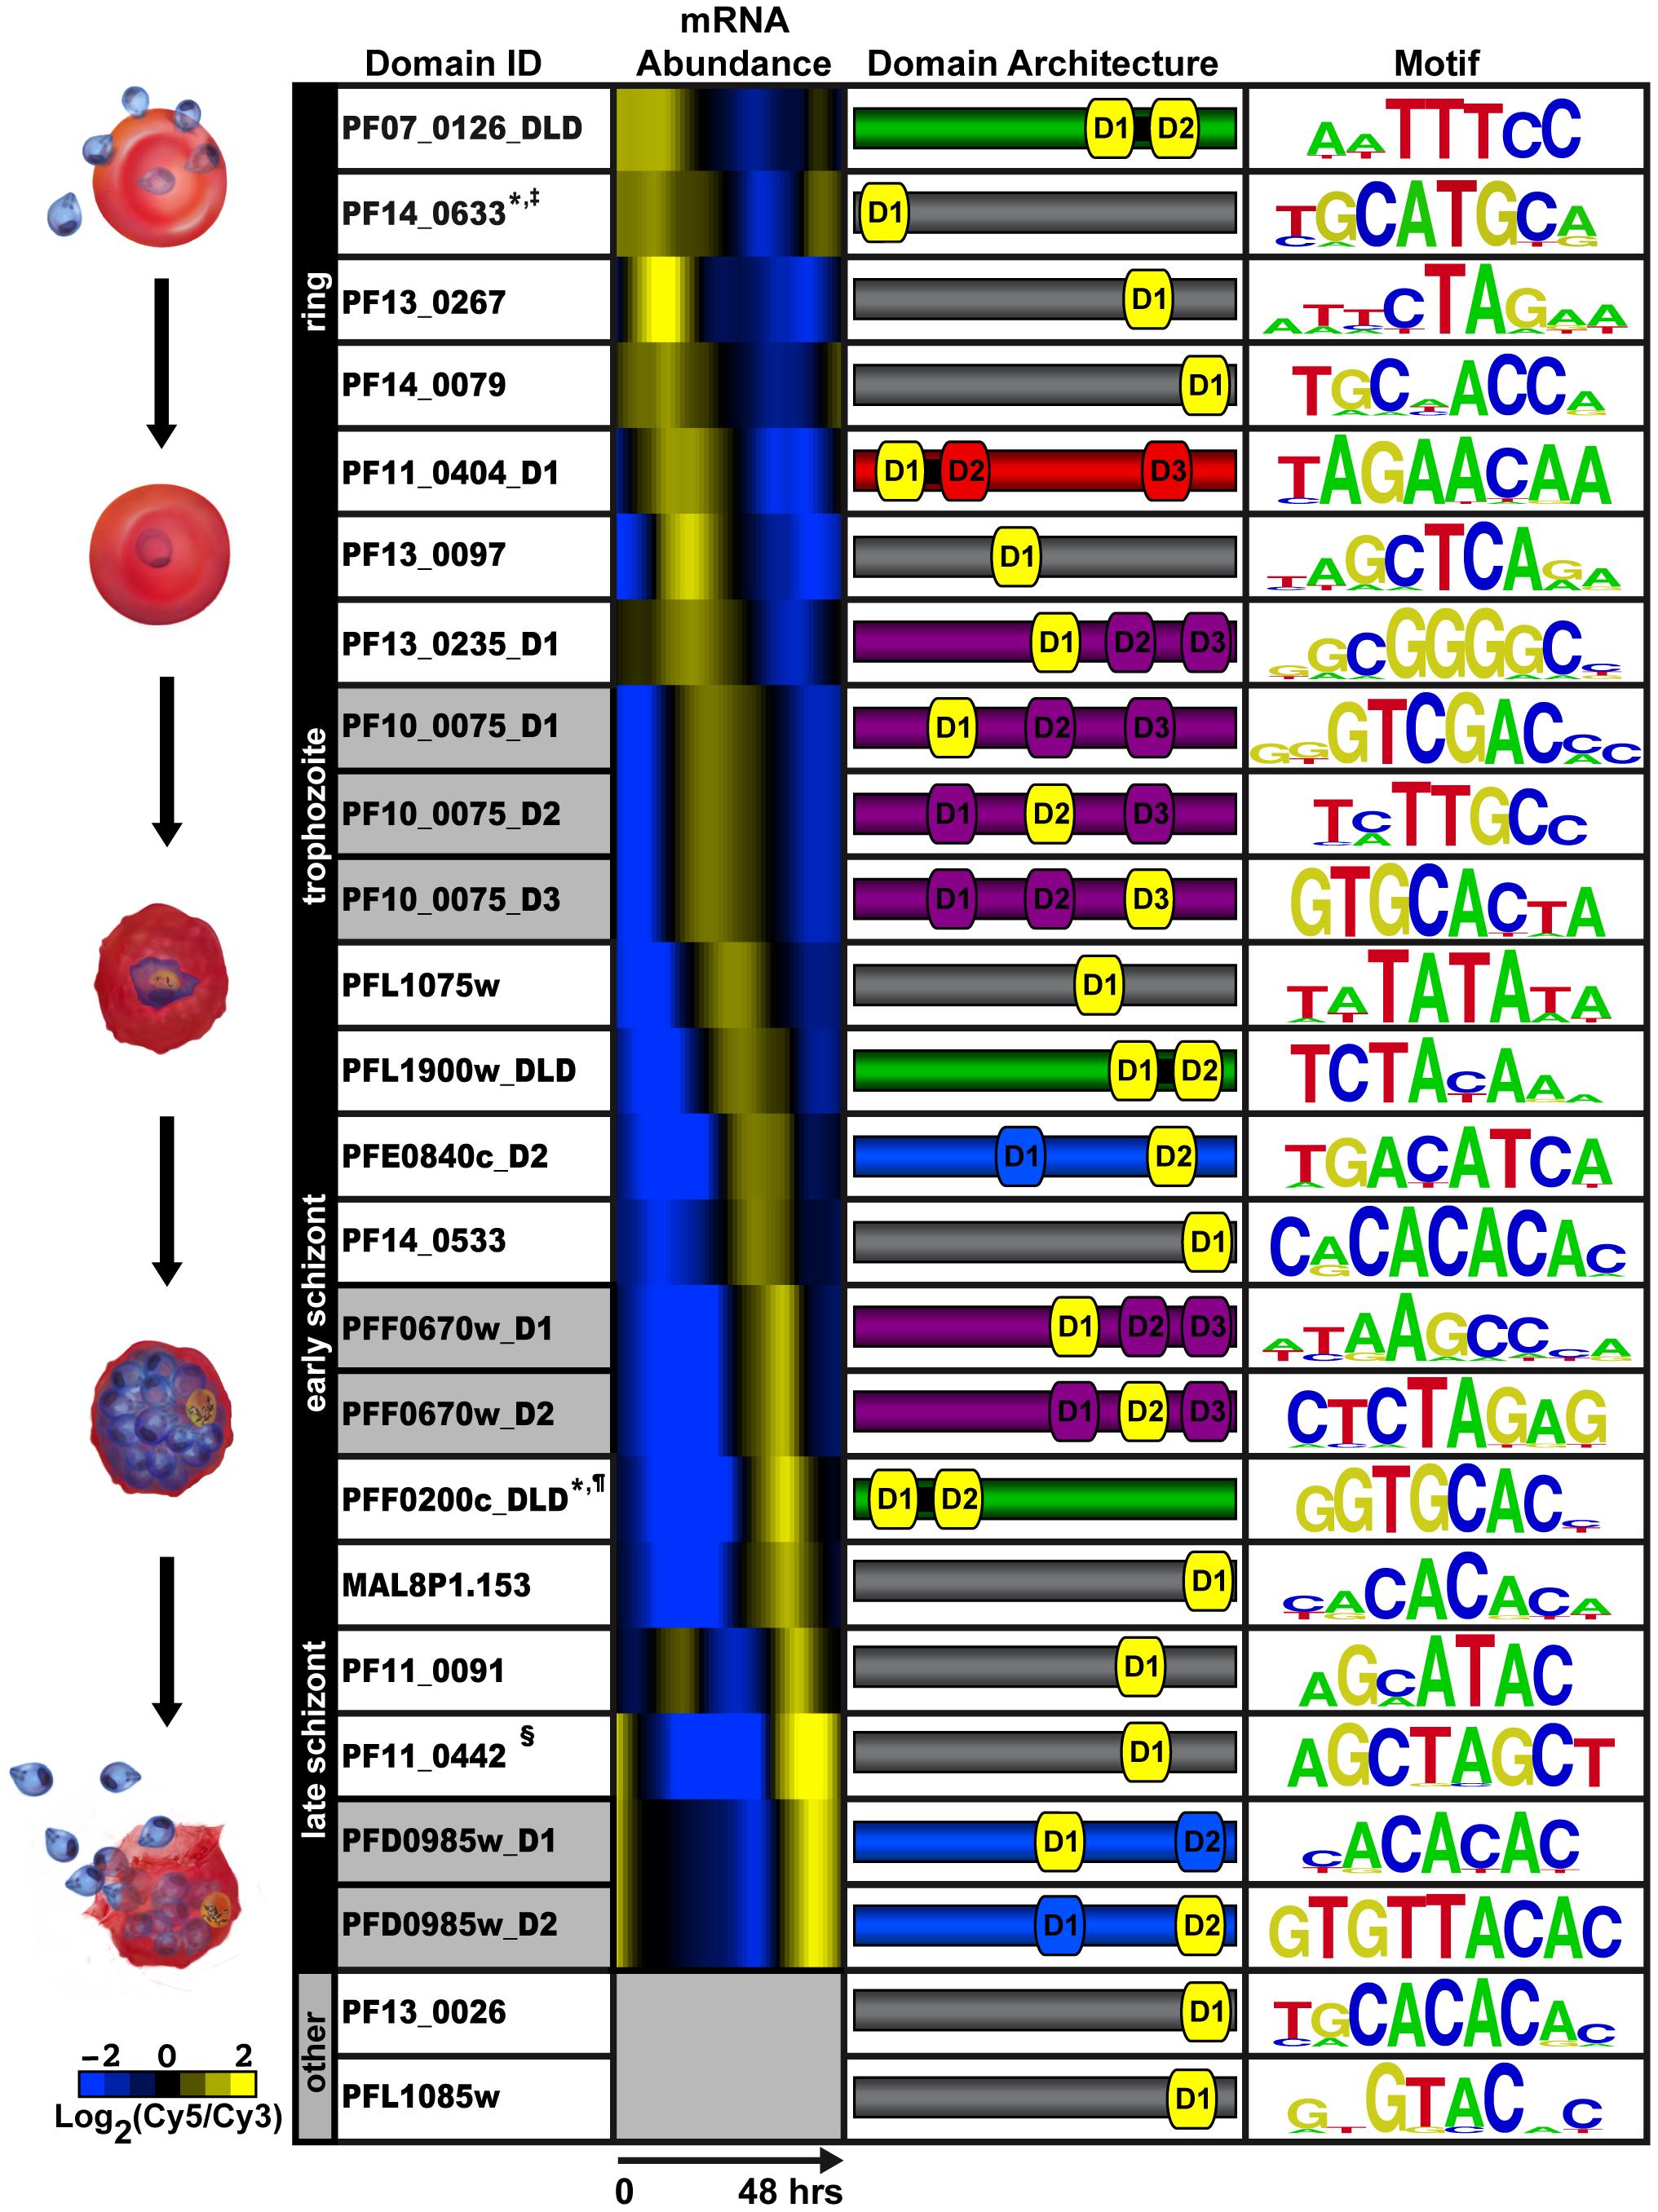 PBM derived motifs for <i>P. falciparum</i> ApiAP2 domains.